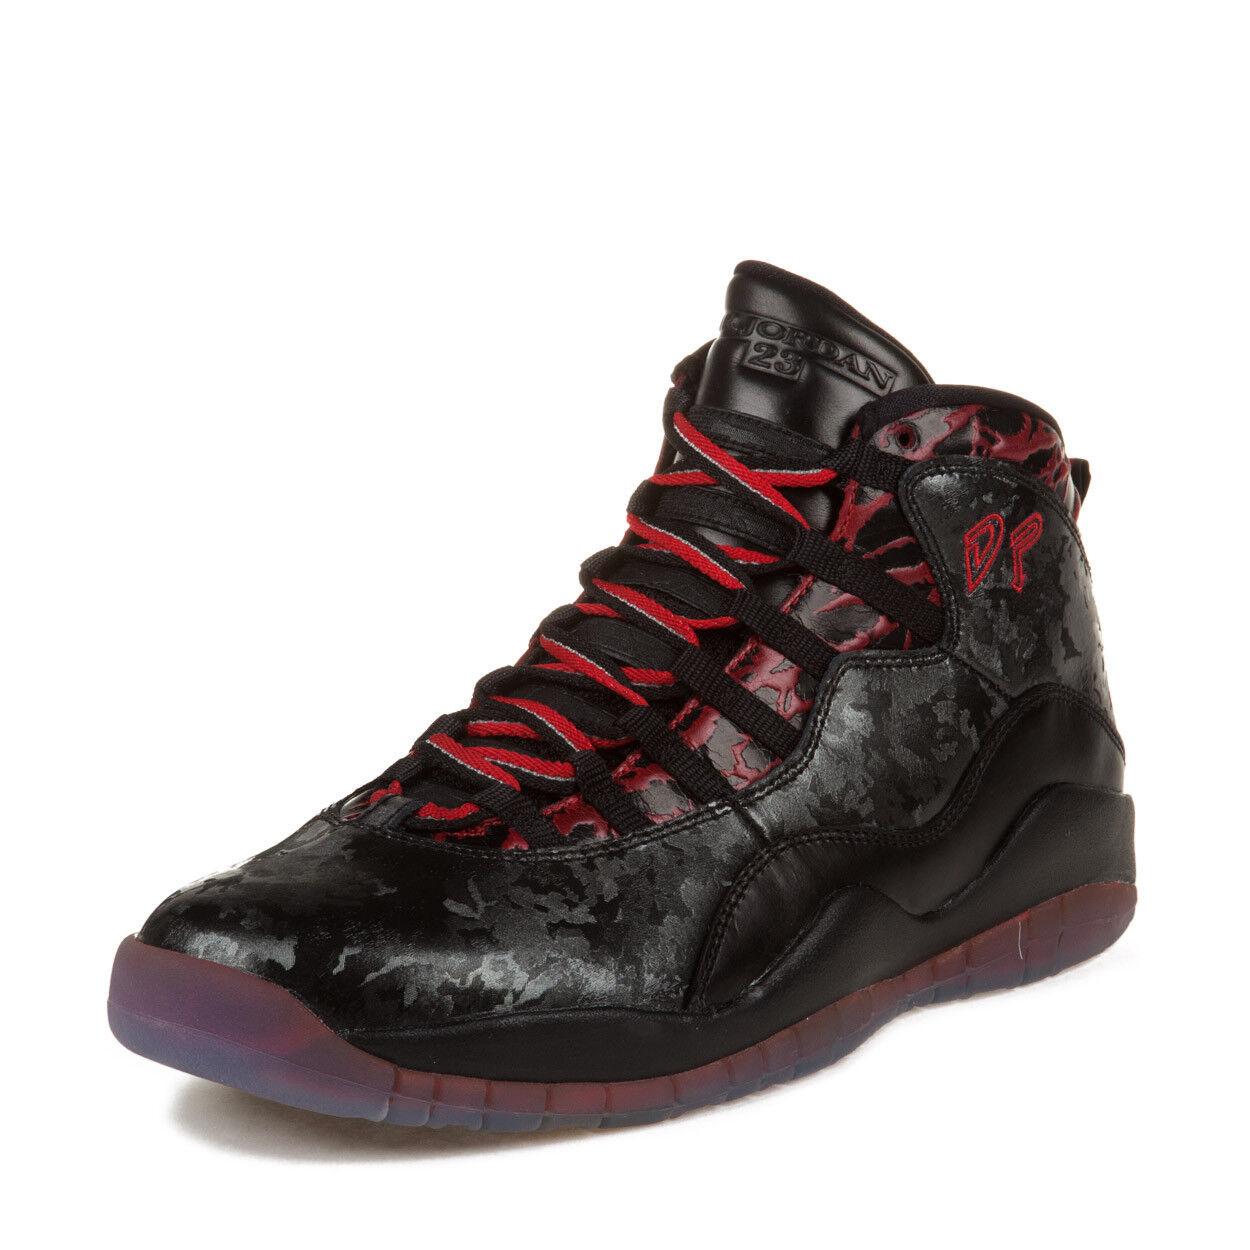 Nike Mens Air Jordan 10 Retro DB